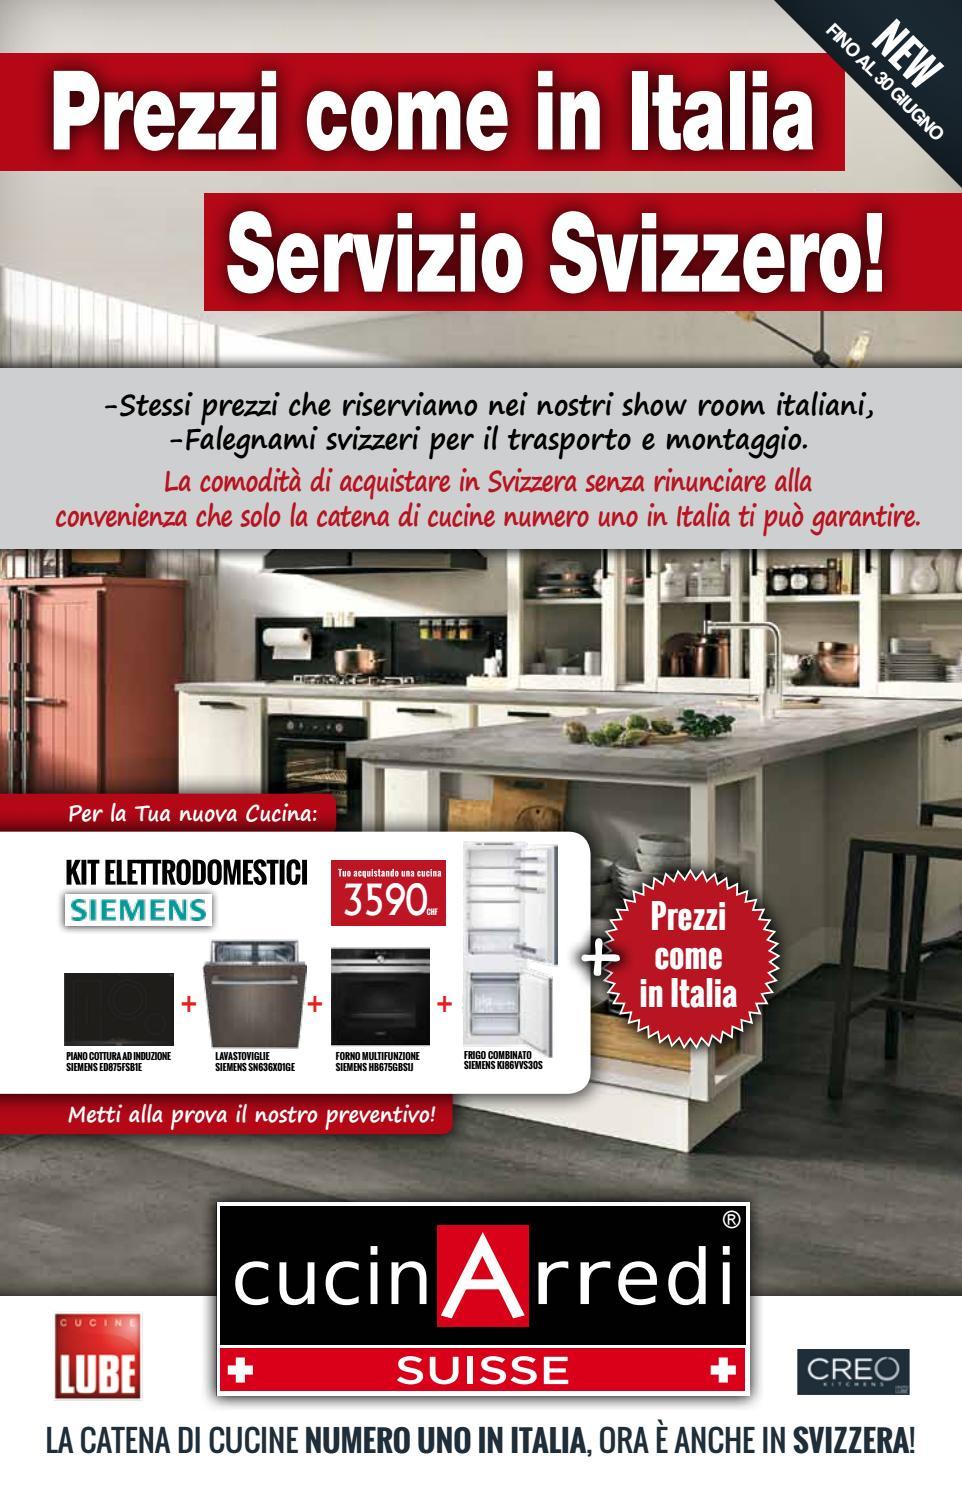 Stunning Lavastoviglie Siemens Prezzi Contemporary - Lepicentre.info ...